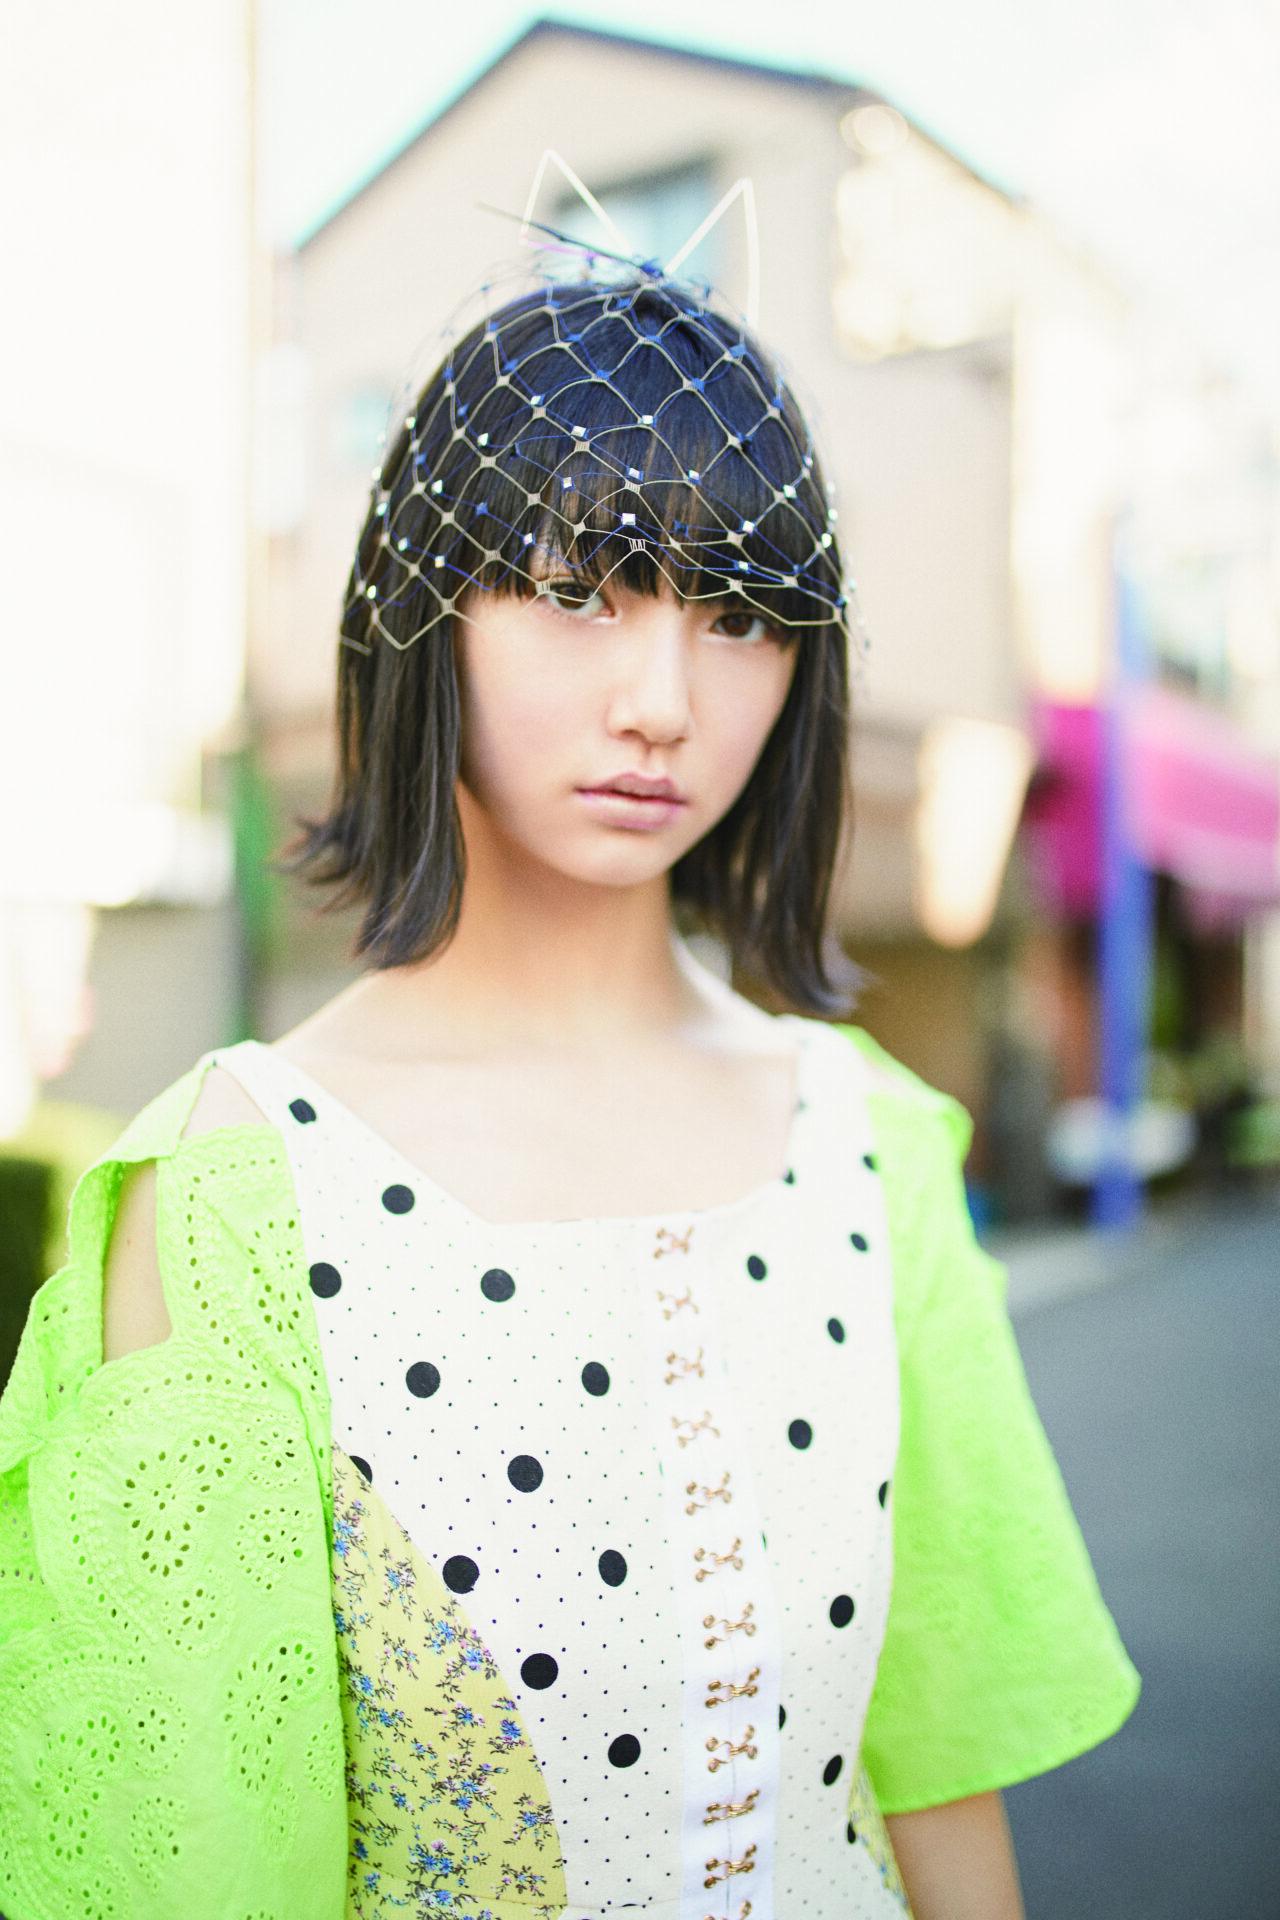 ihme『issue6』 (sentimental)インタビュー モデル・女優:小宮山 莉渚